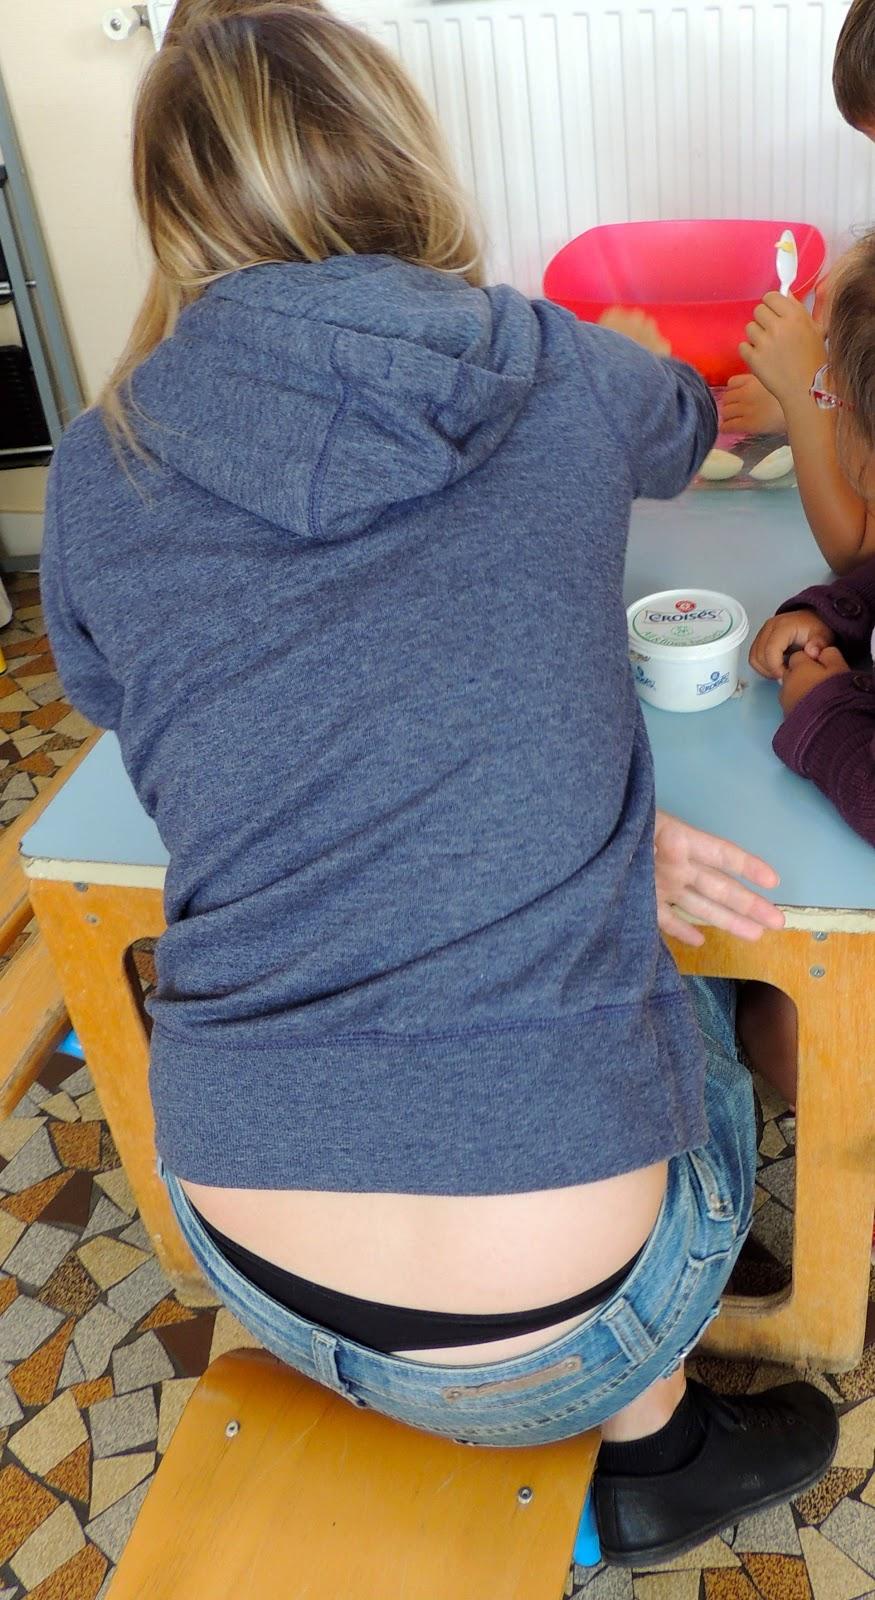 Thong Voyeur Tea Party At Work